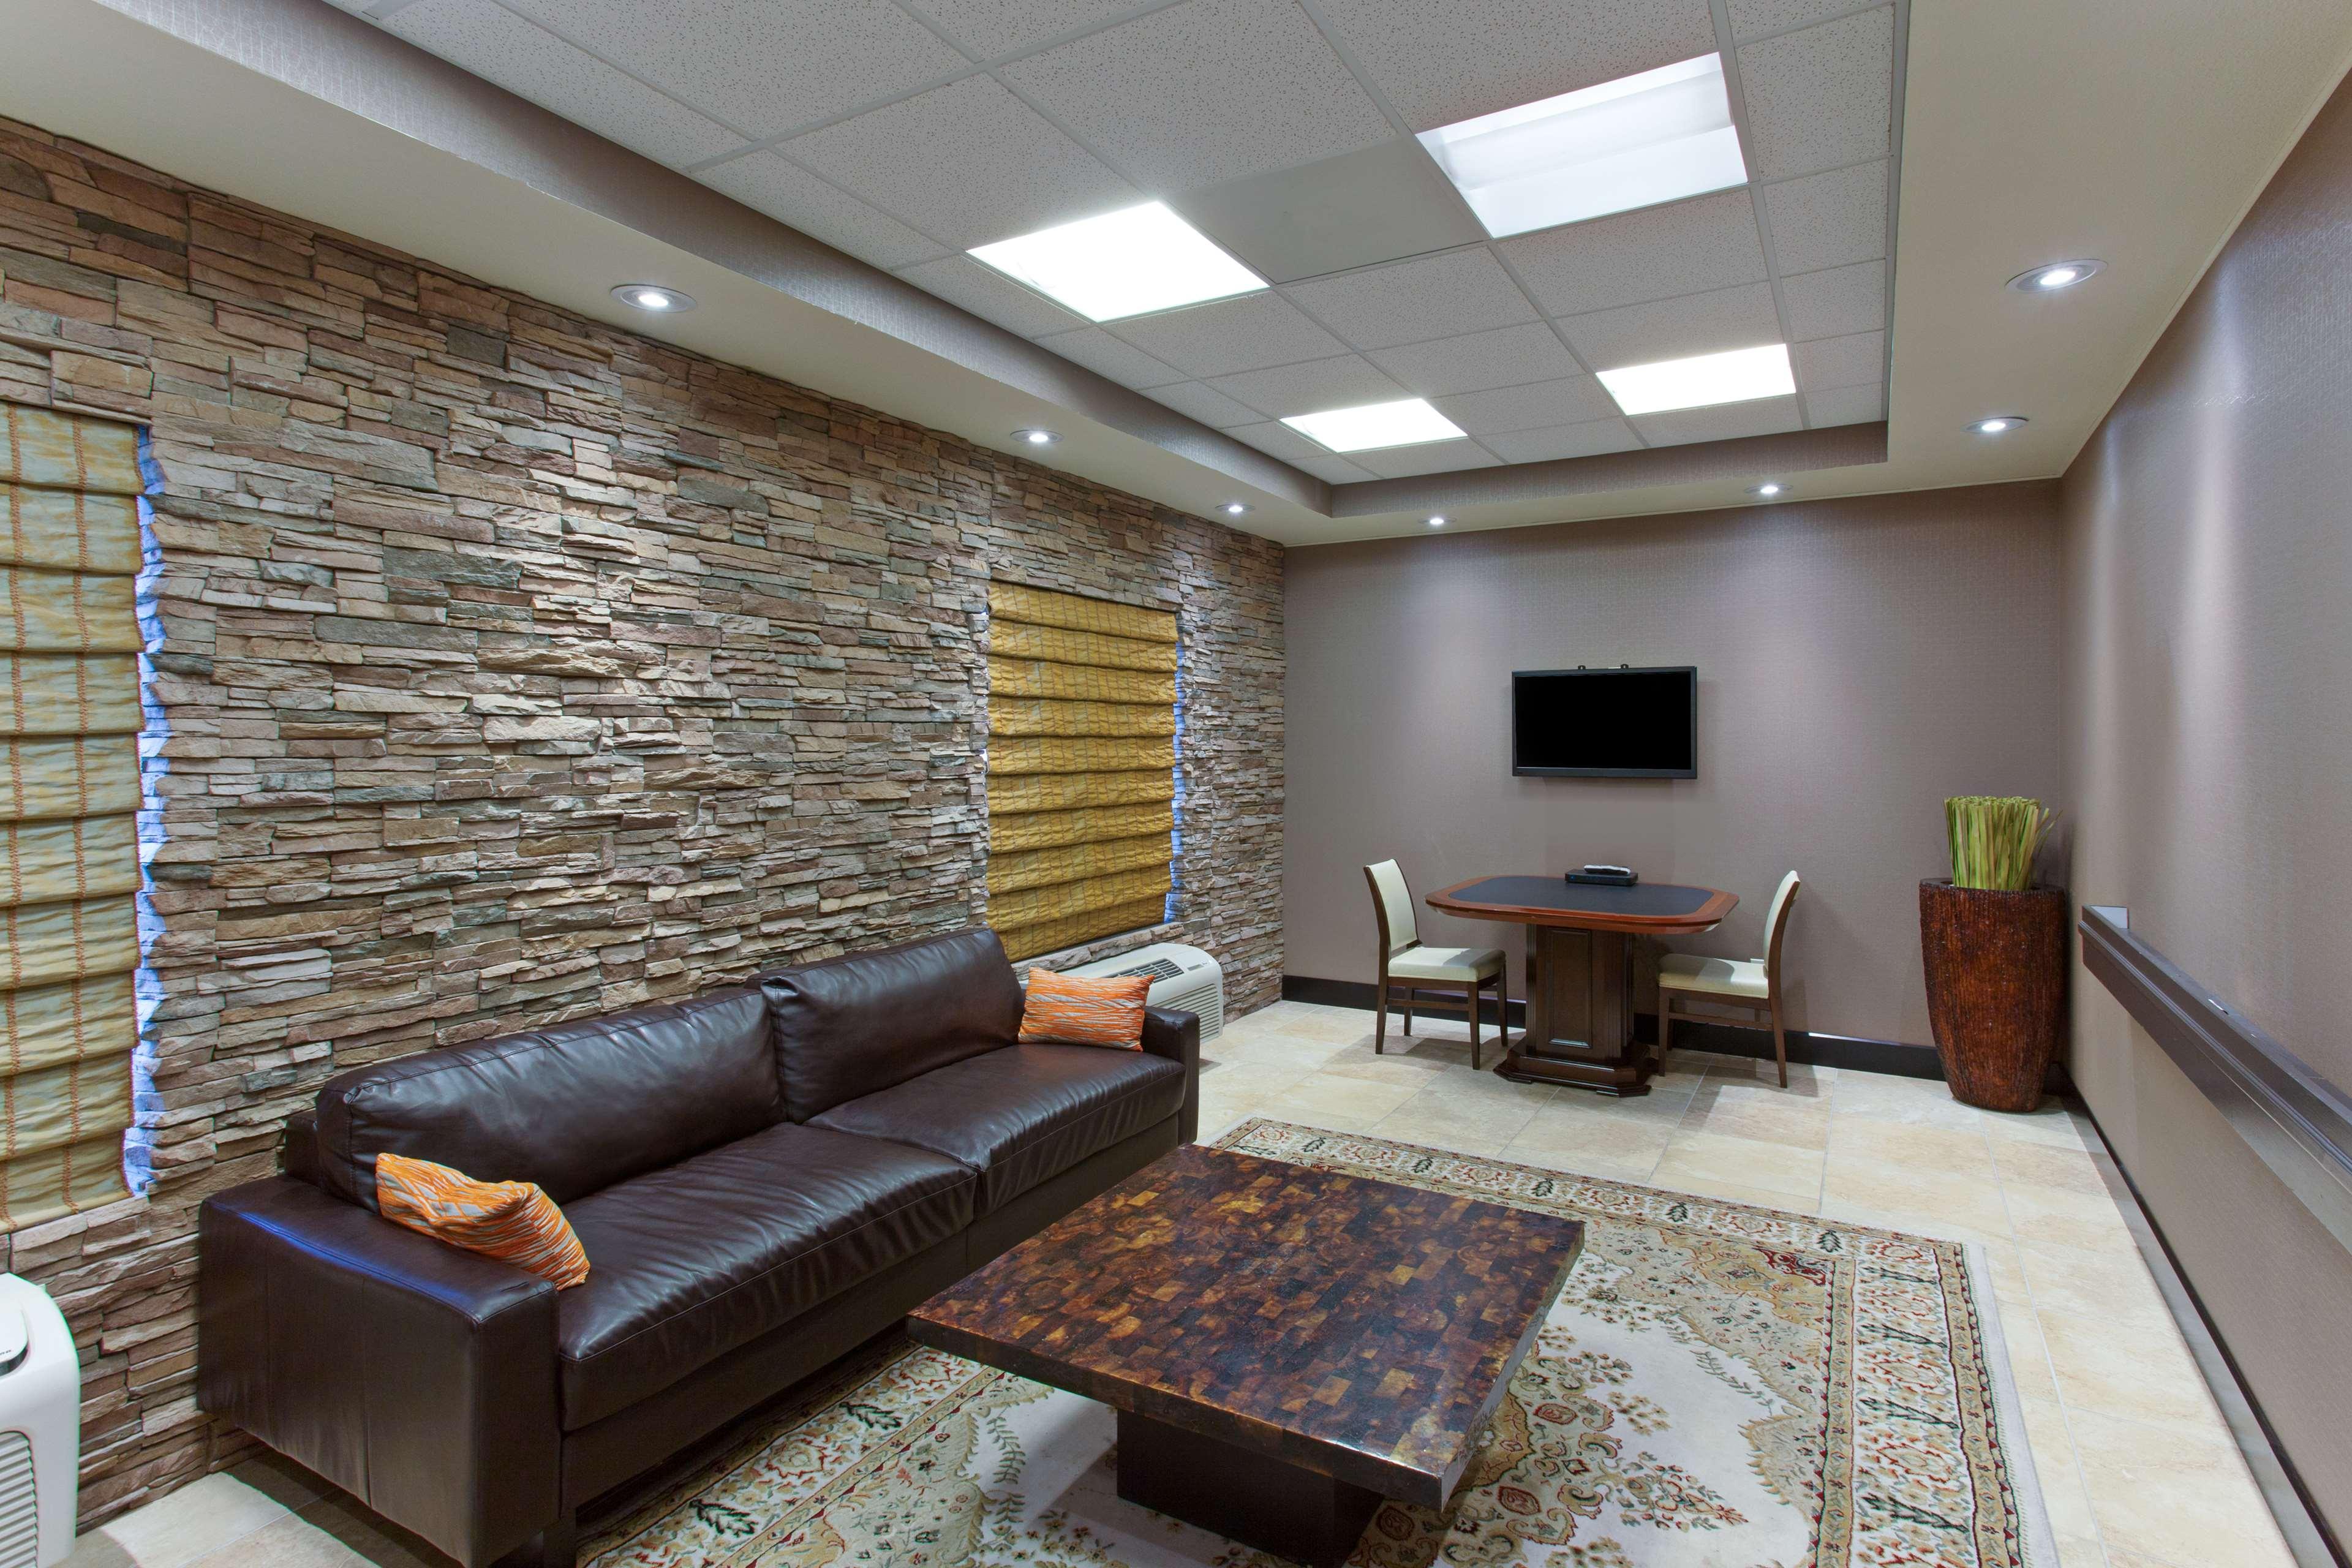 Hampton Inn & Suites Roseville image 15